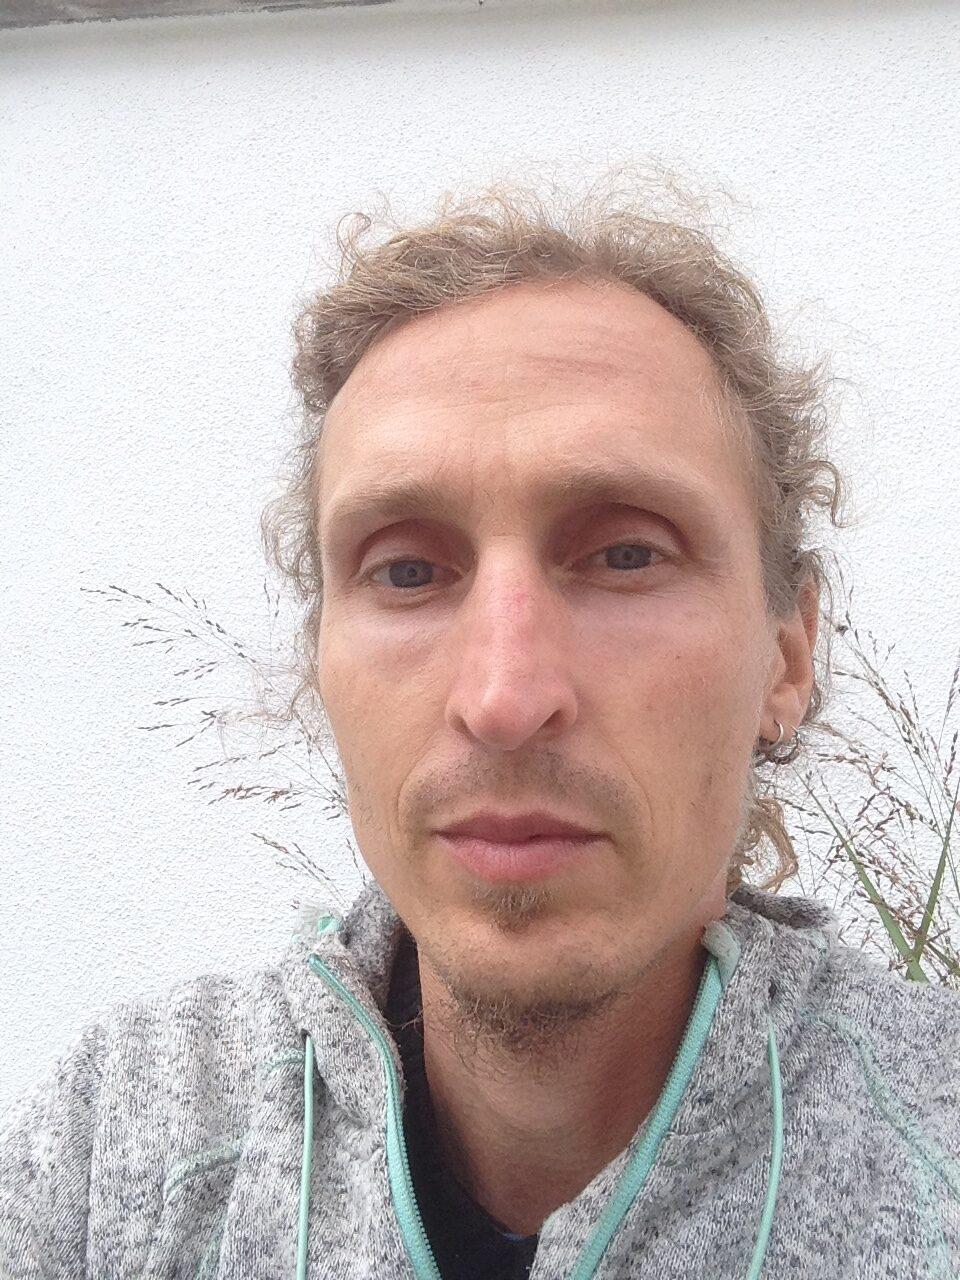 Simon Jäckel, Karlsruhe